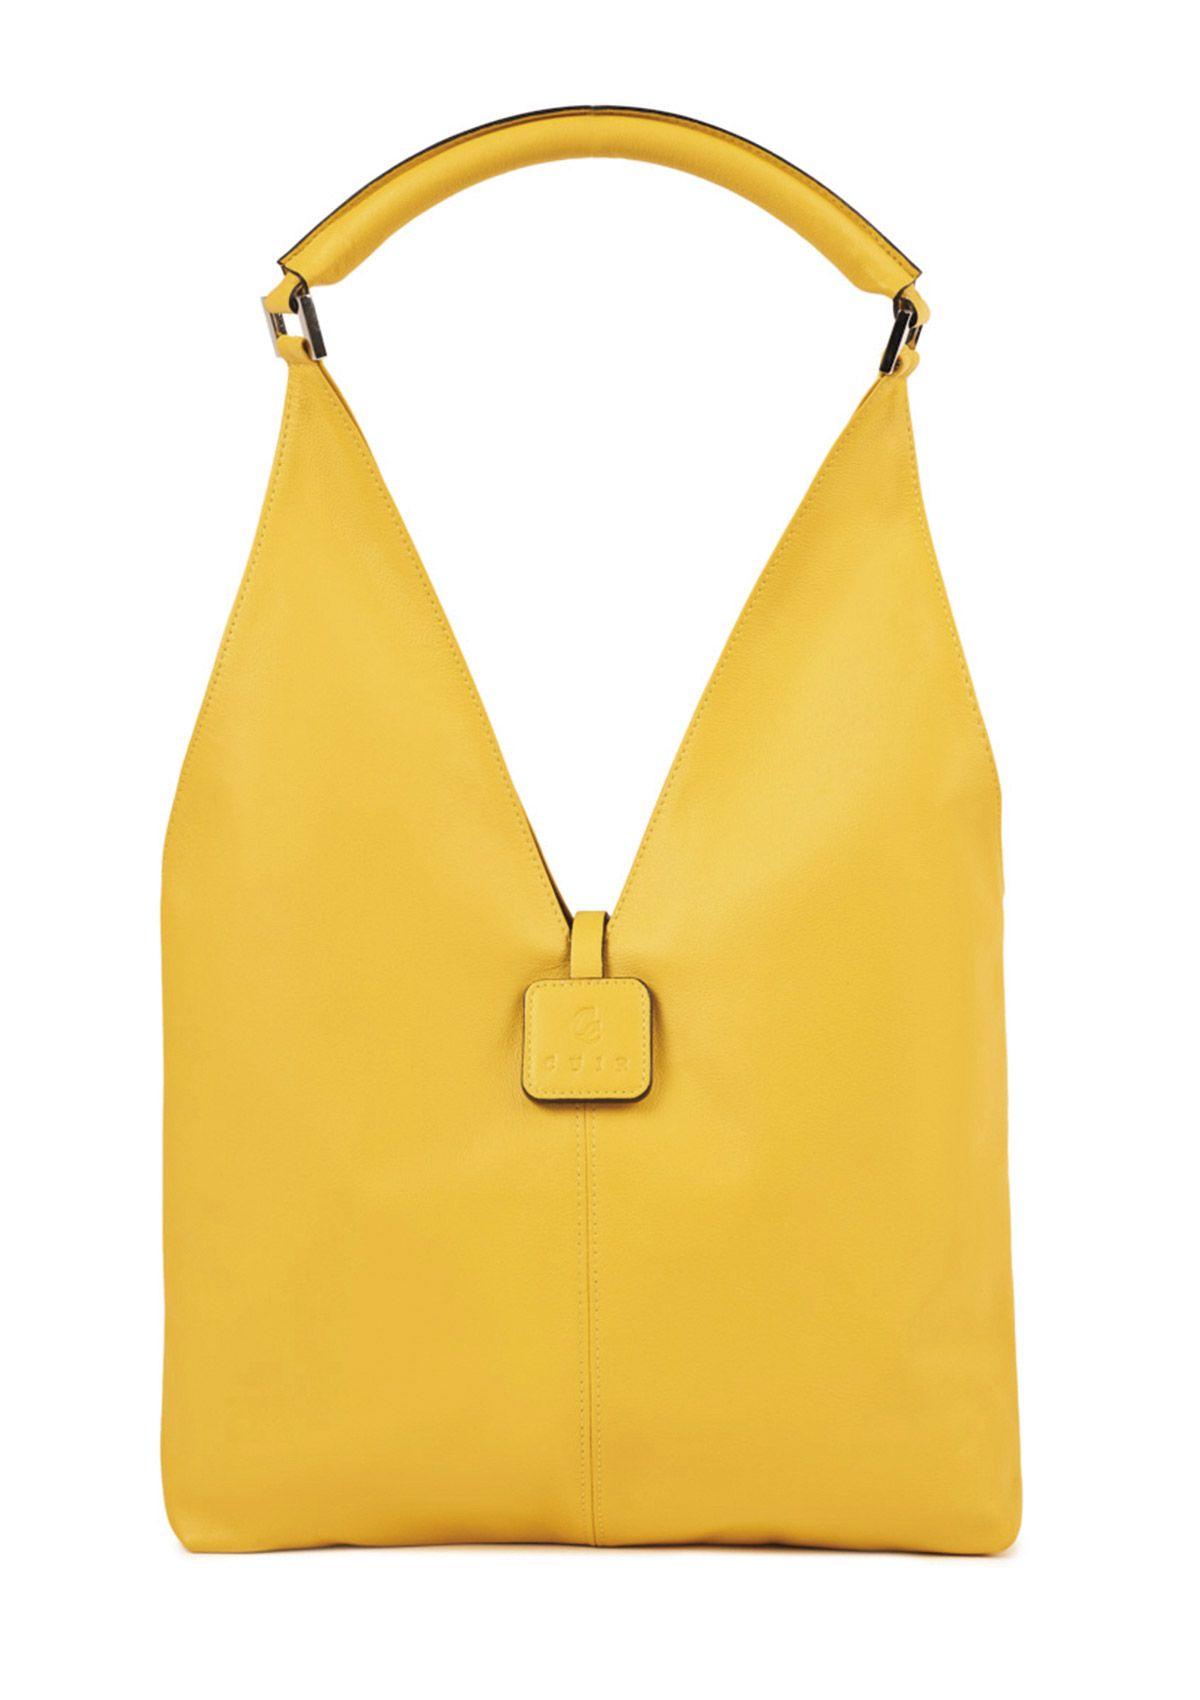 Bolso amarillo de CC Cuir.